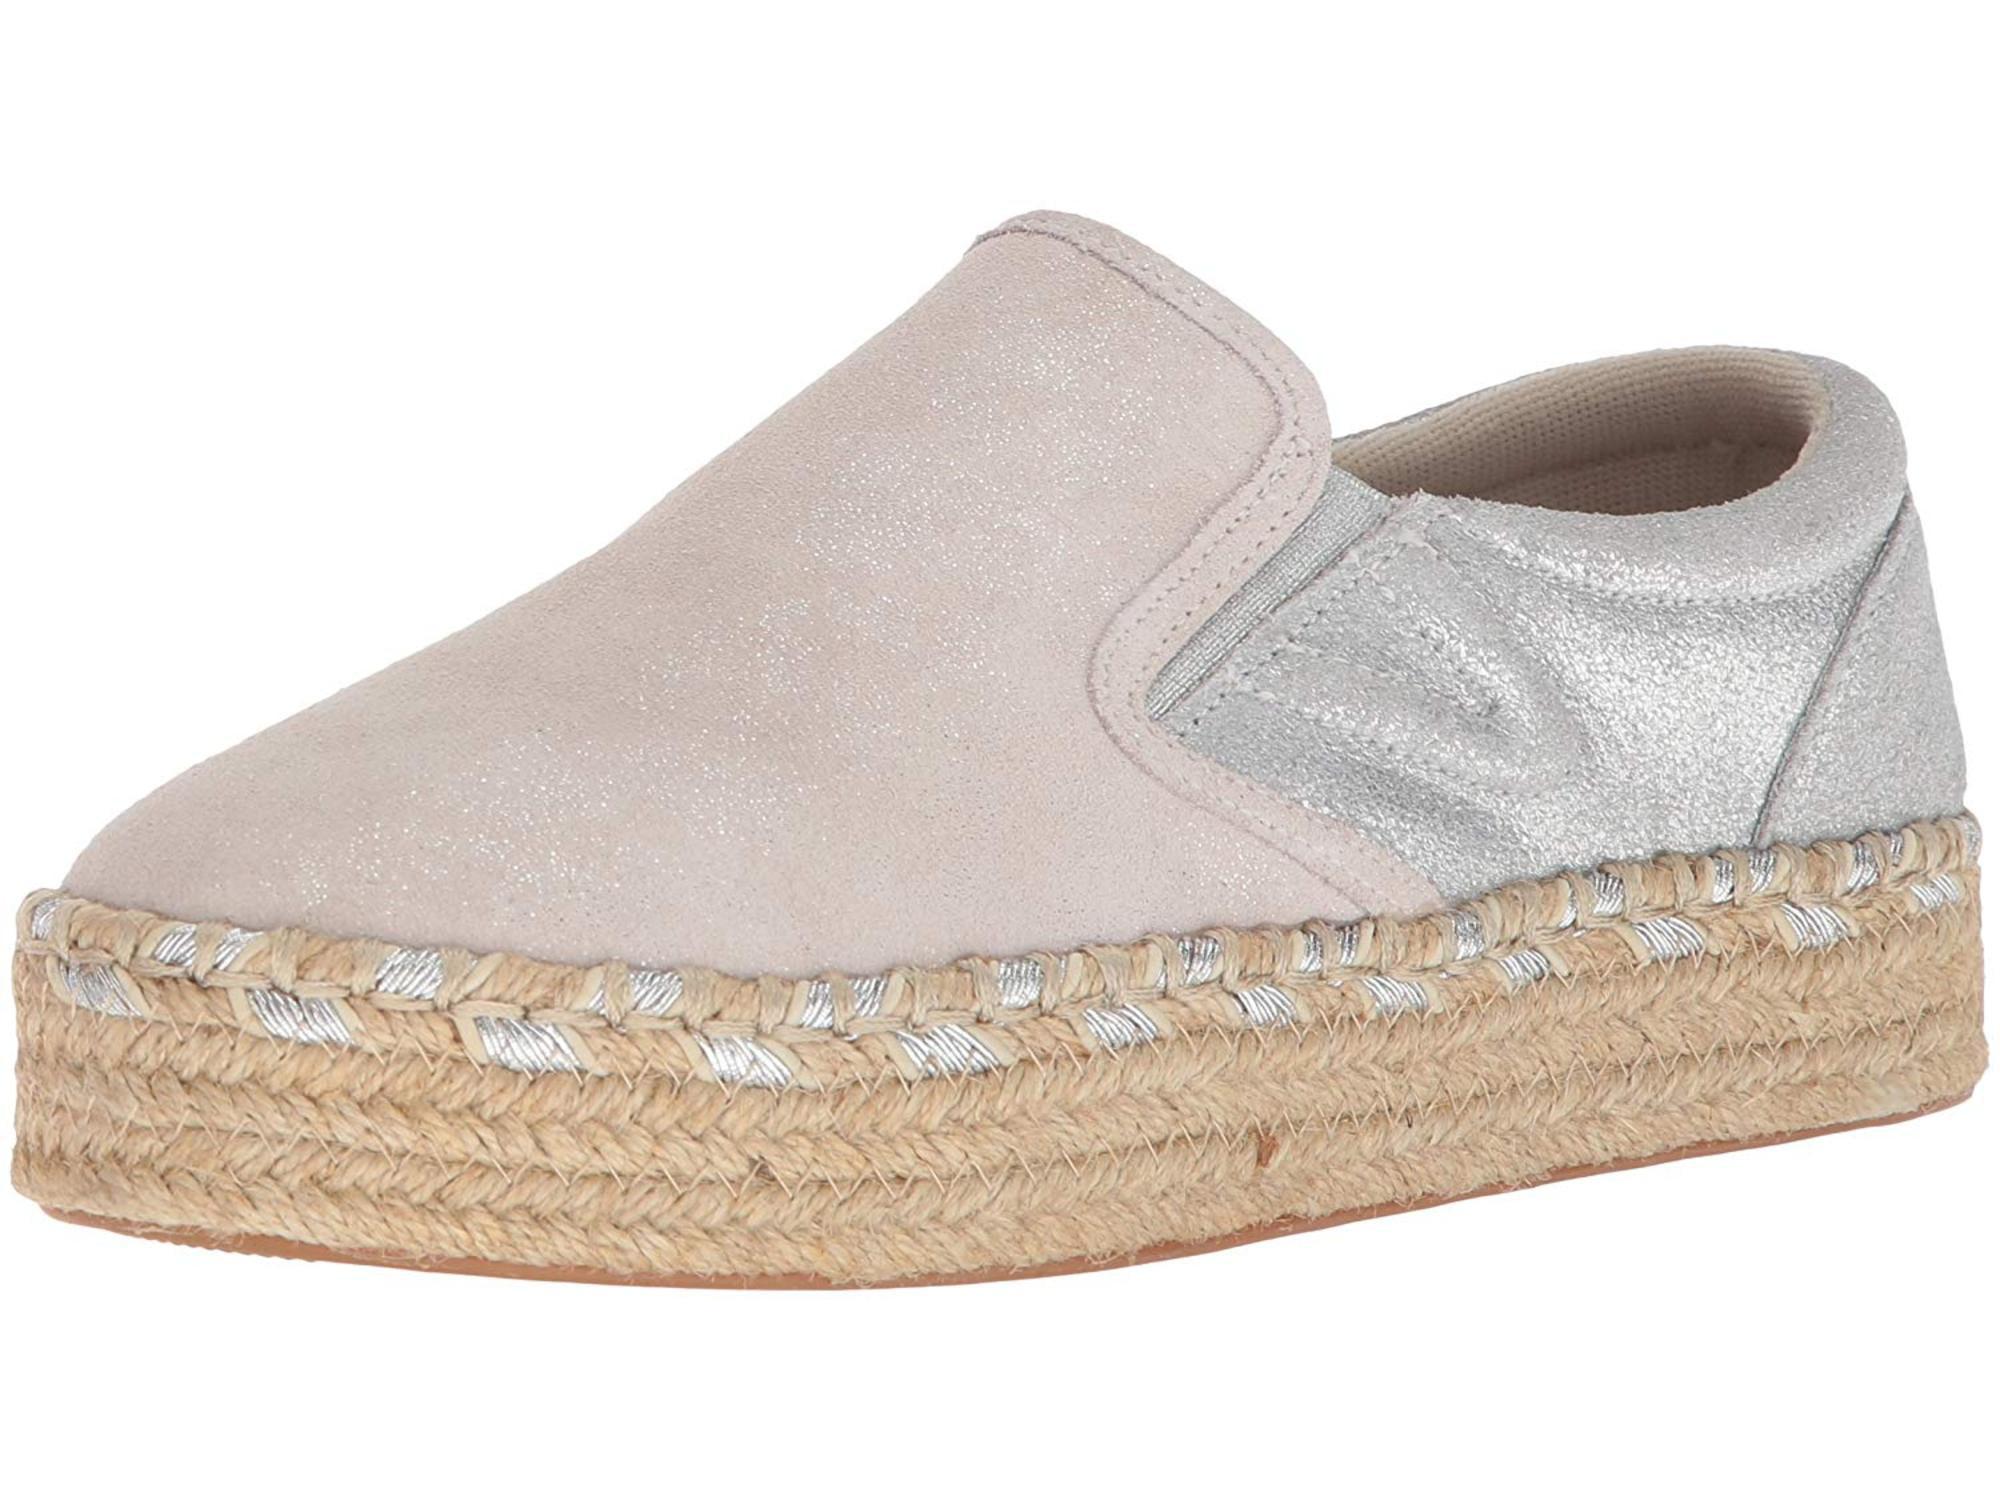 Tretorn Women's Emilia2 Sneaker by Tretorn